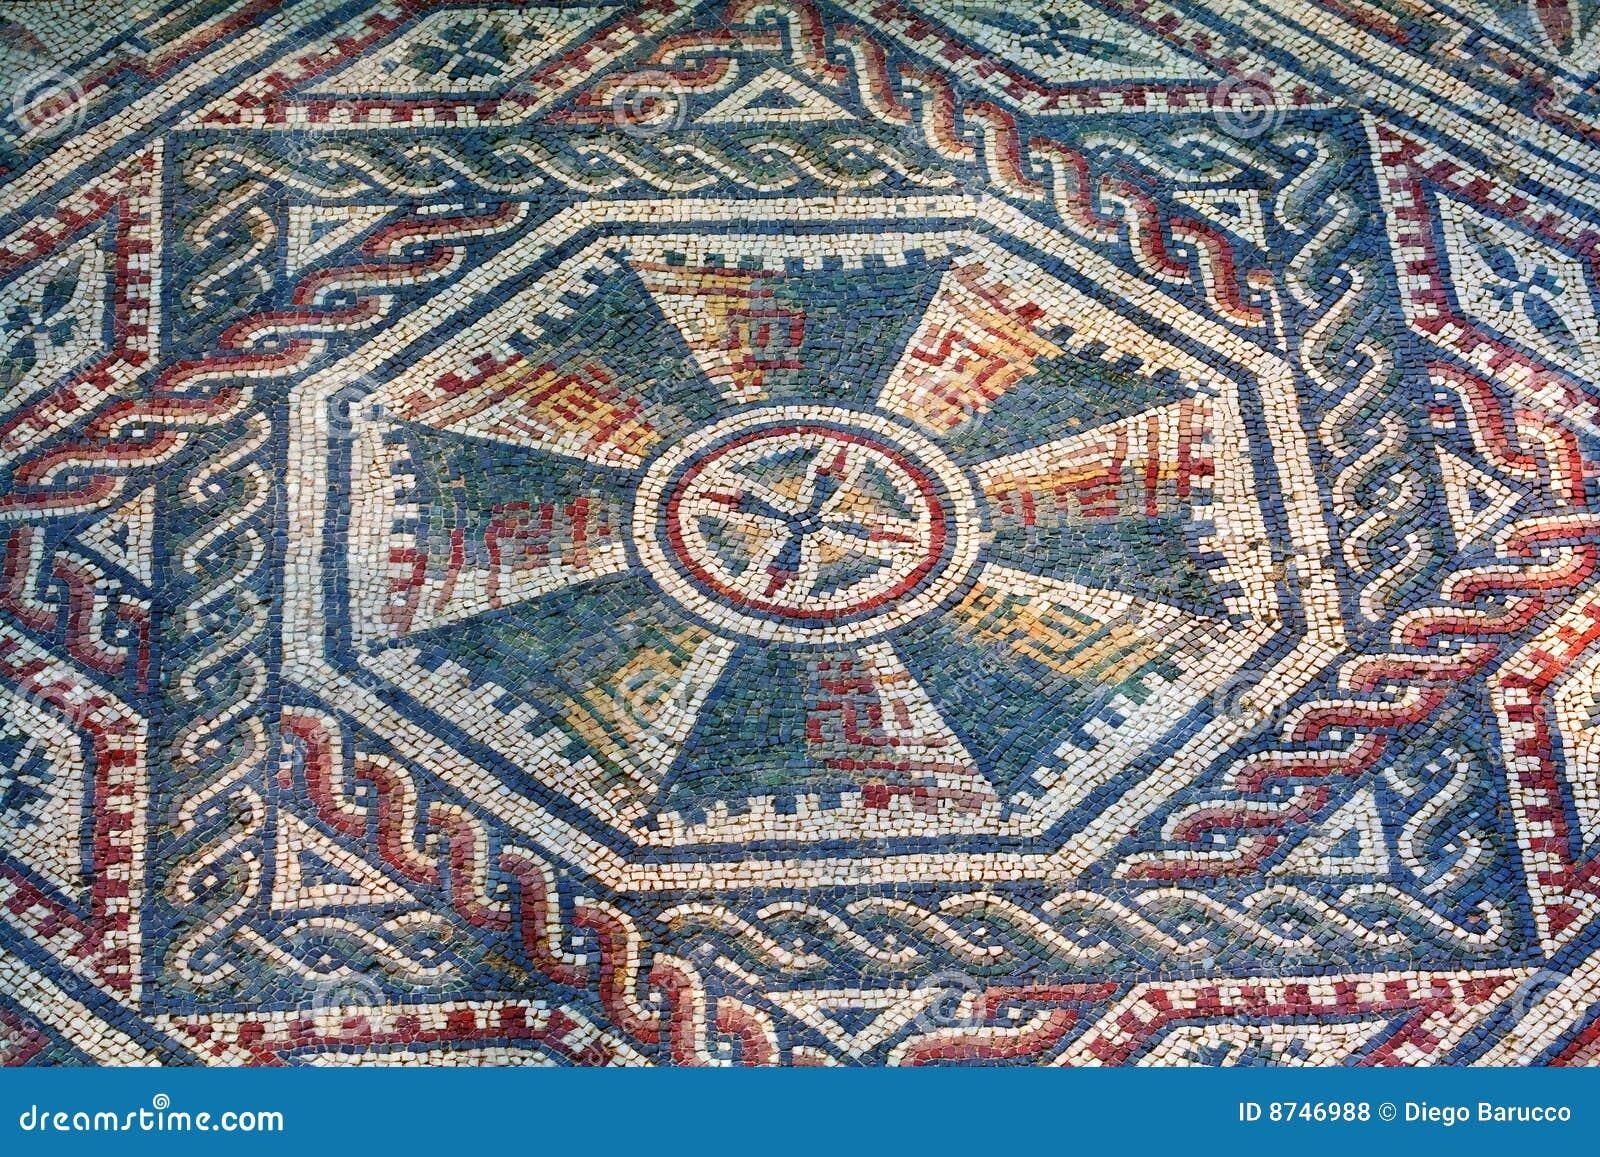 Mosaico romano del chalet sicilia foto de archivo for Mosaico romano